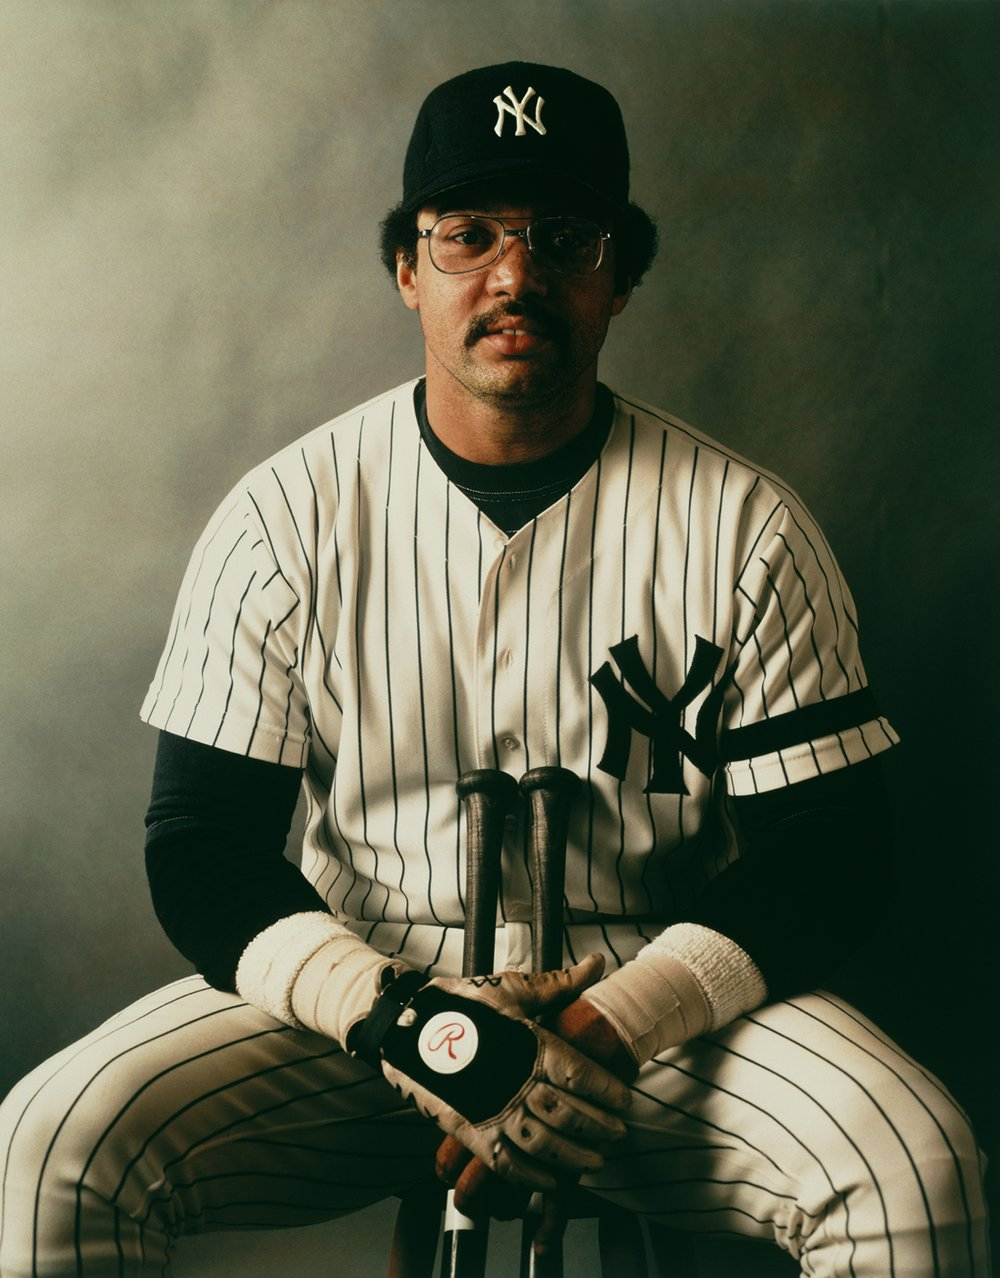 Reggie Jackson, 1980